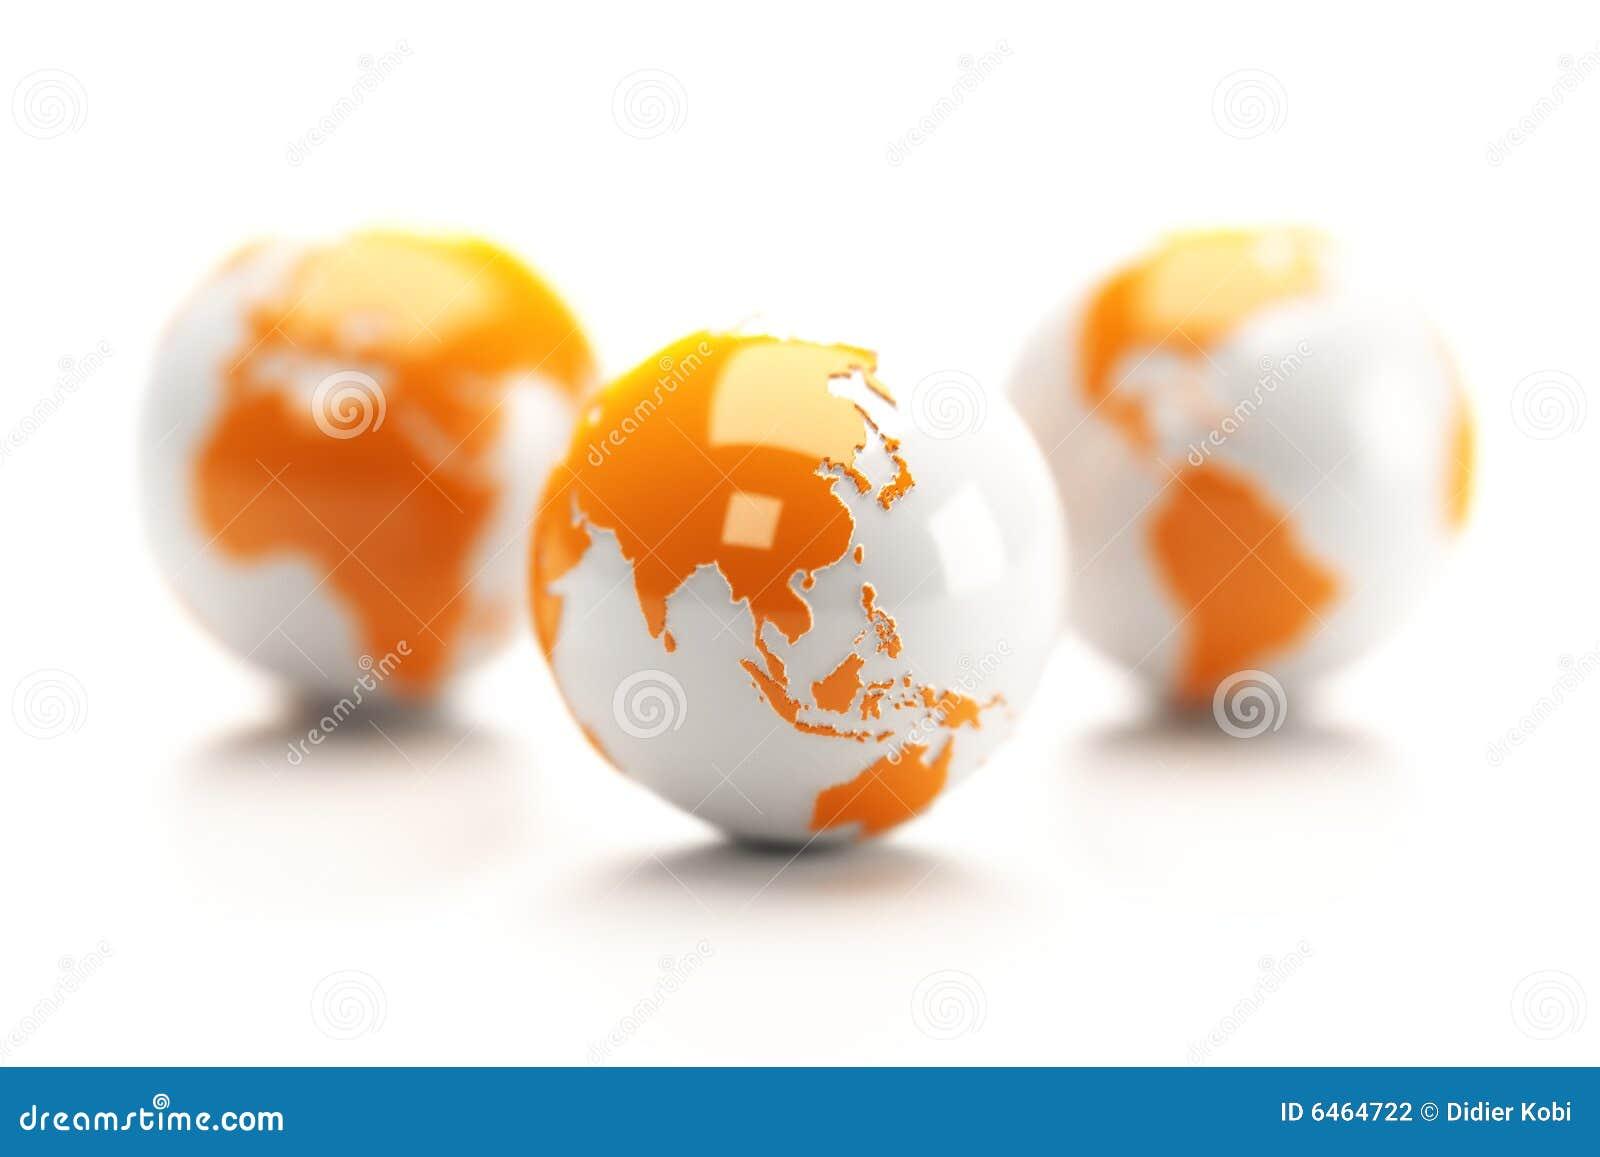 Globo della terra